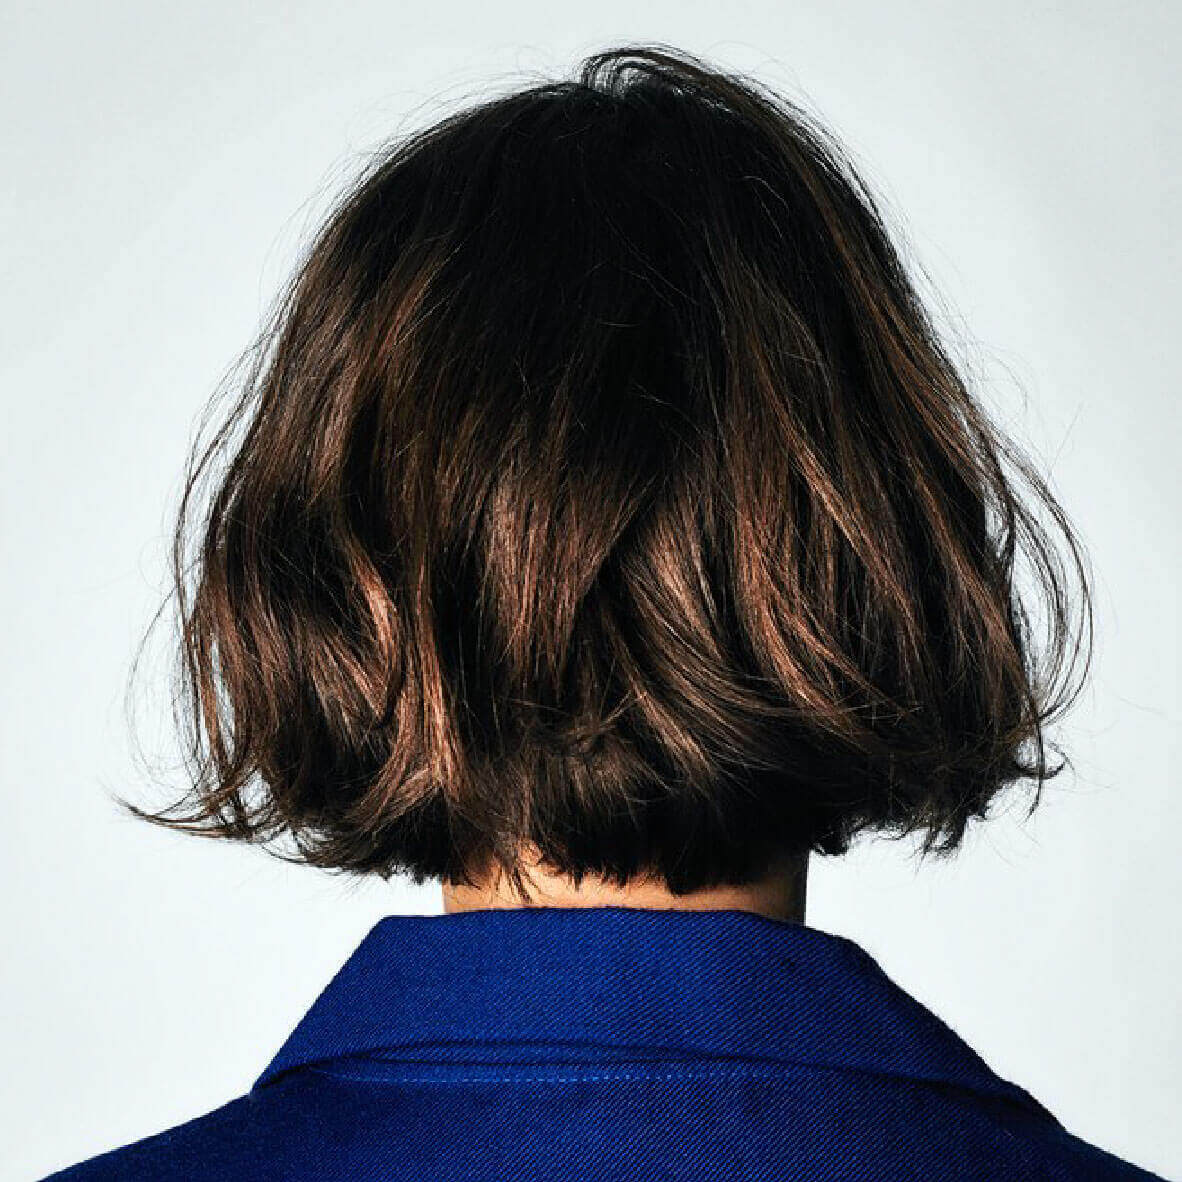 gender-neutral-hair-gq-march-2019-lede 2-01